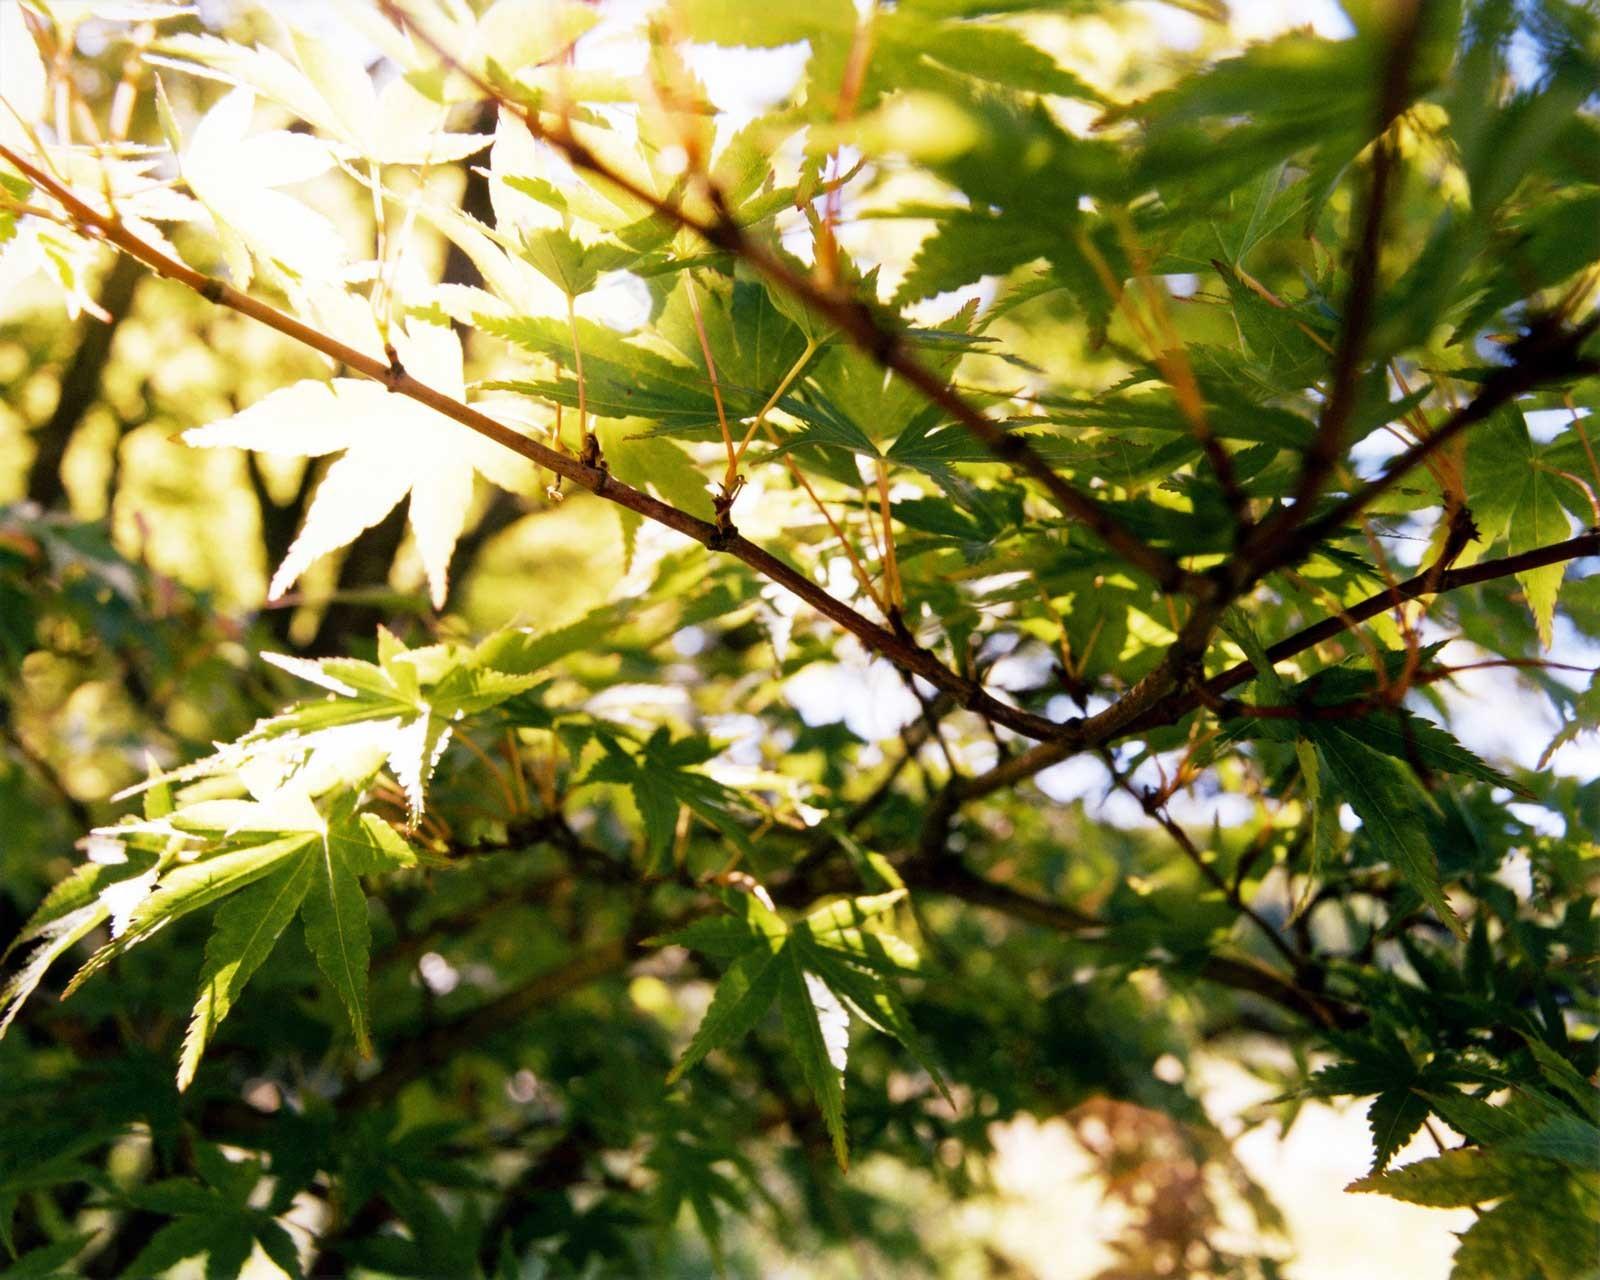 Laure-Maud_08_photographe_jardin-arbre_1